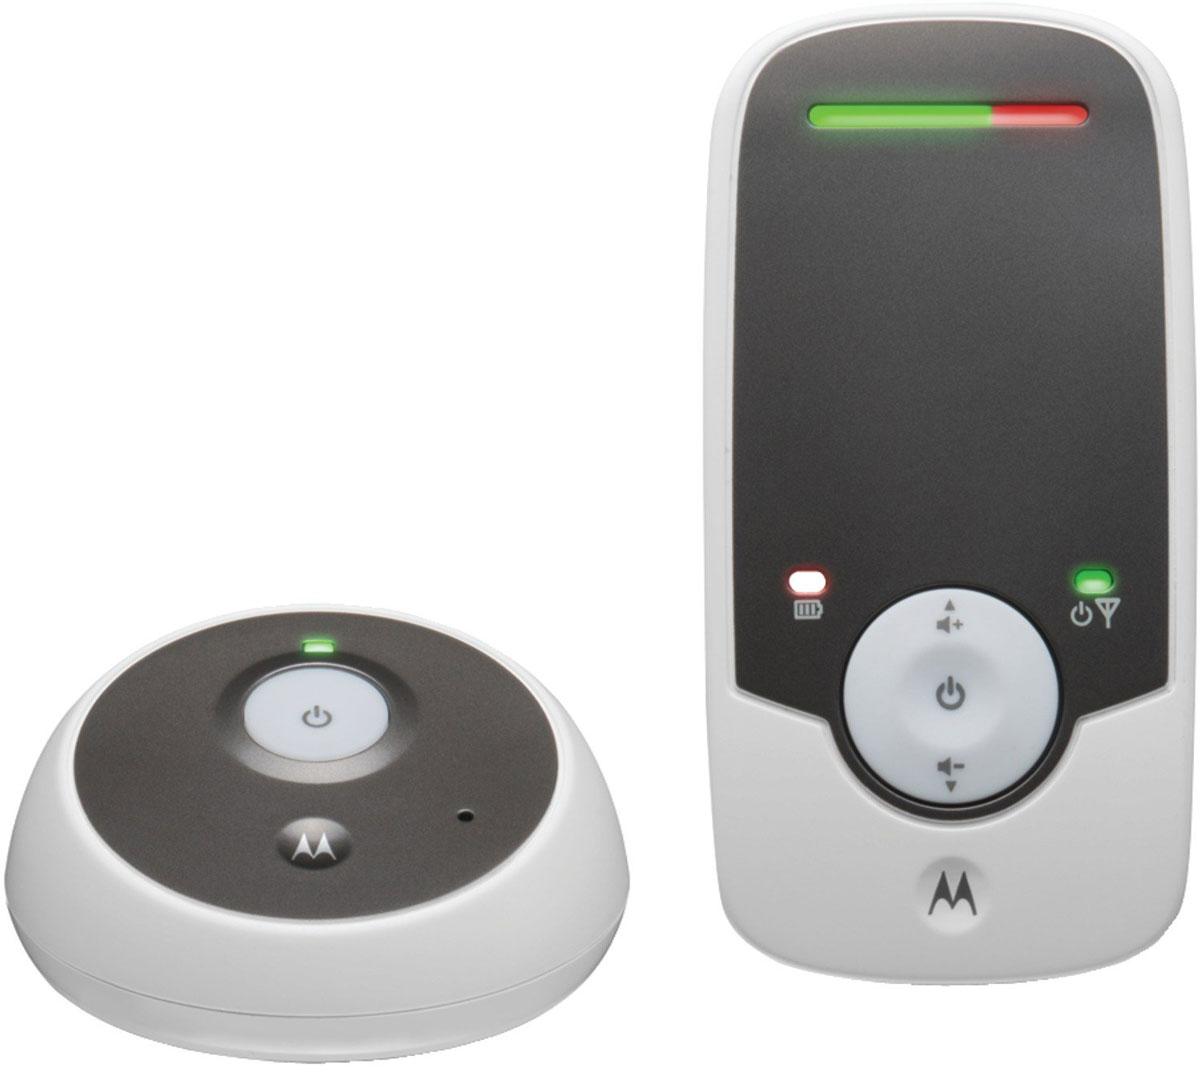 Motorola МВР160, White Black радионяня радионяня motorola mbp16